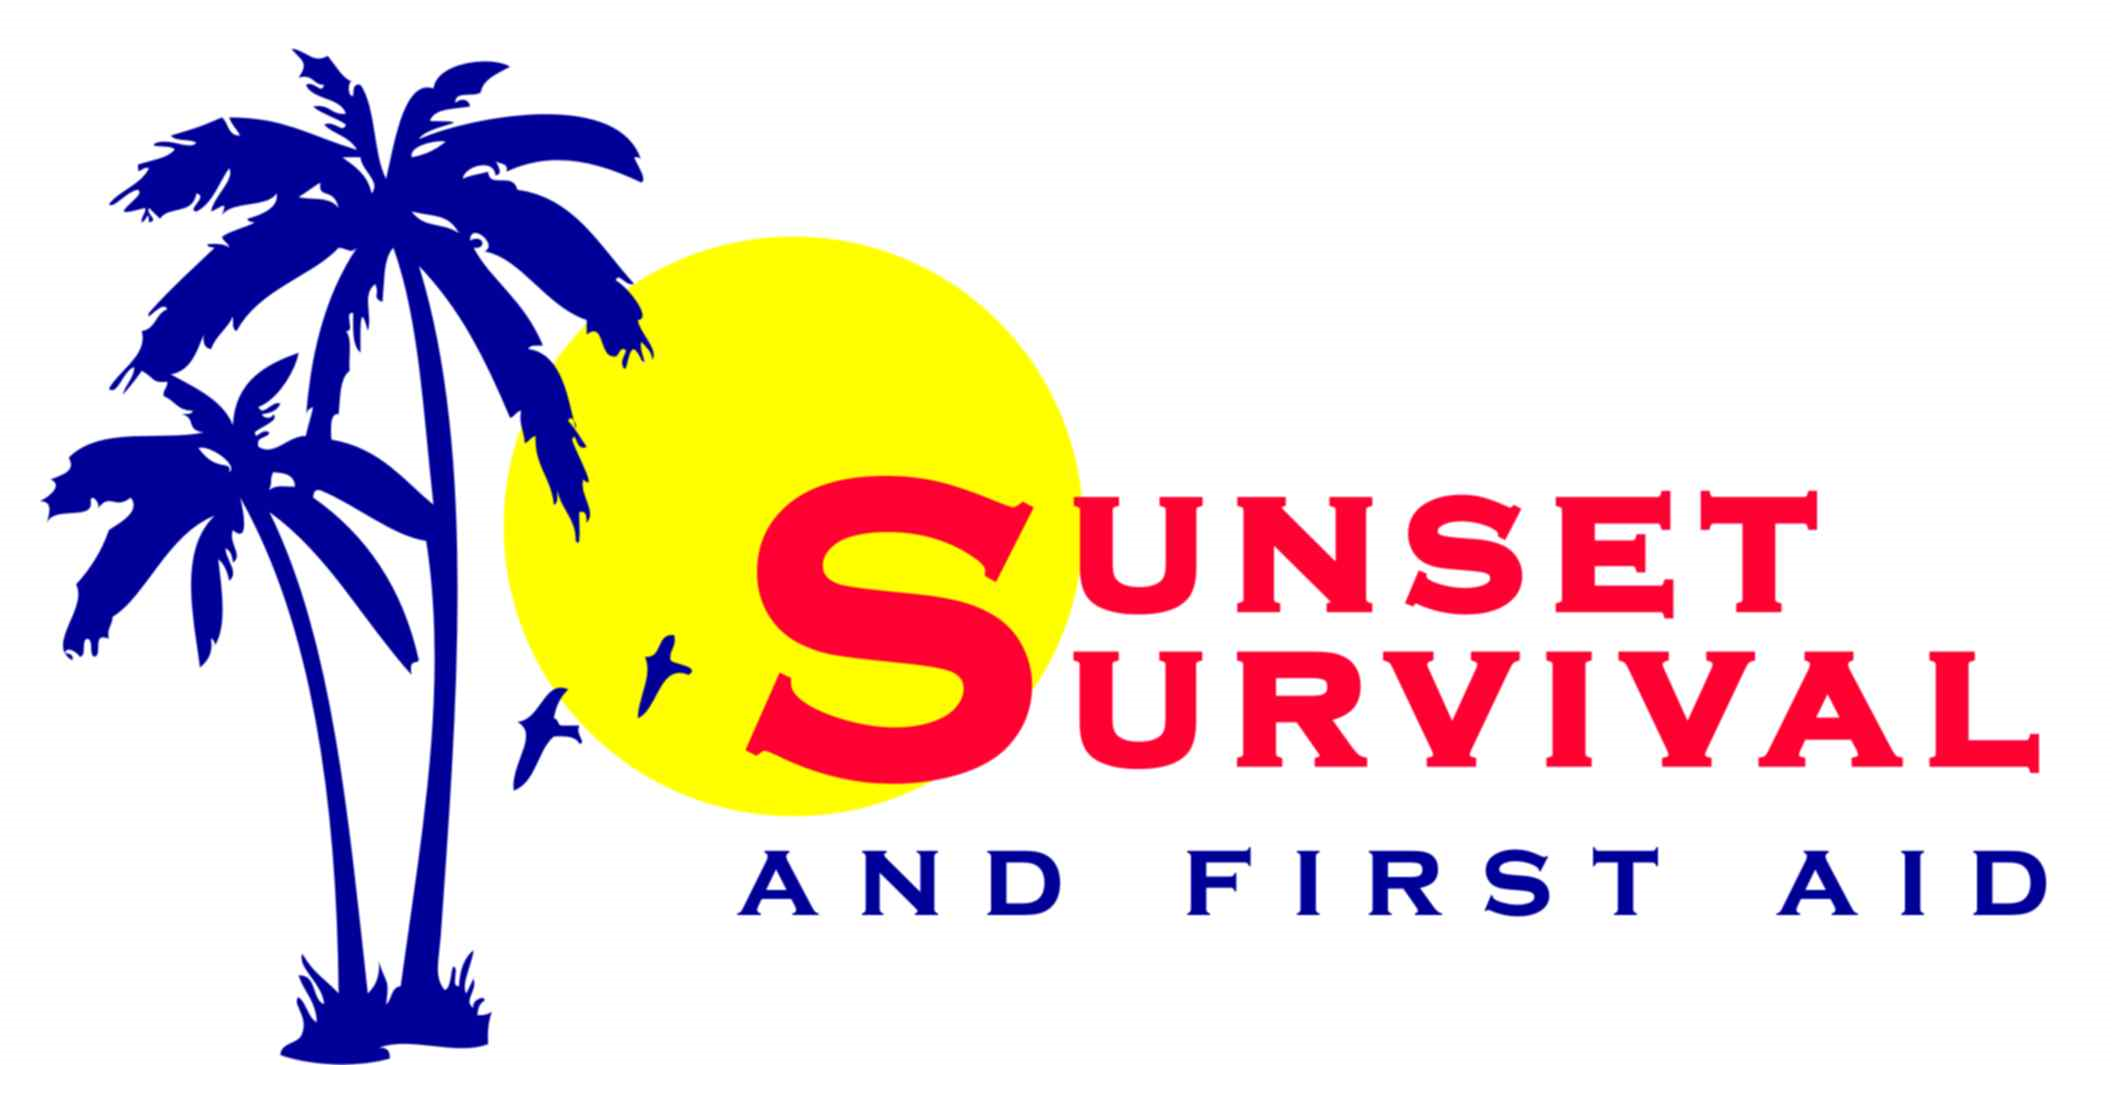 Sunset Survival emergency kits